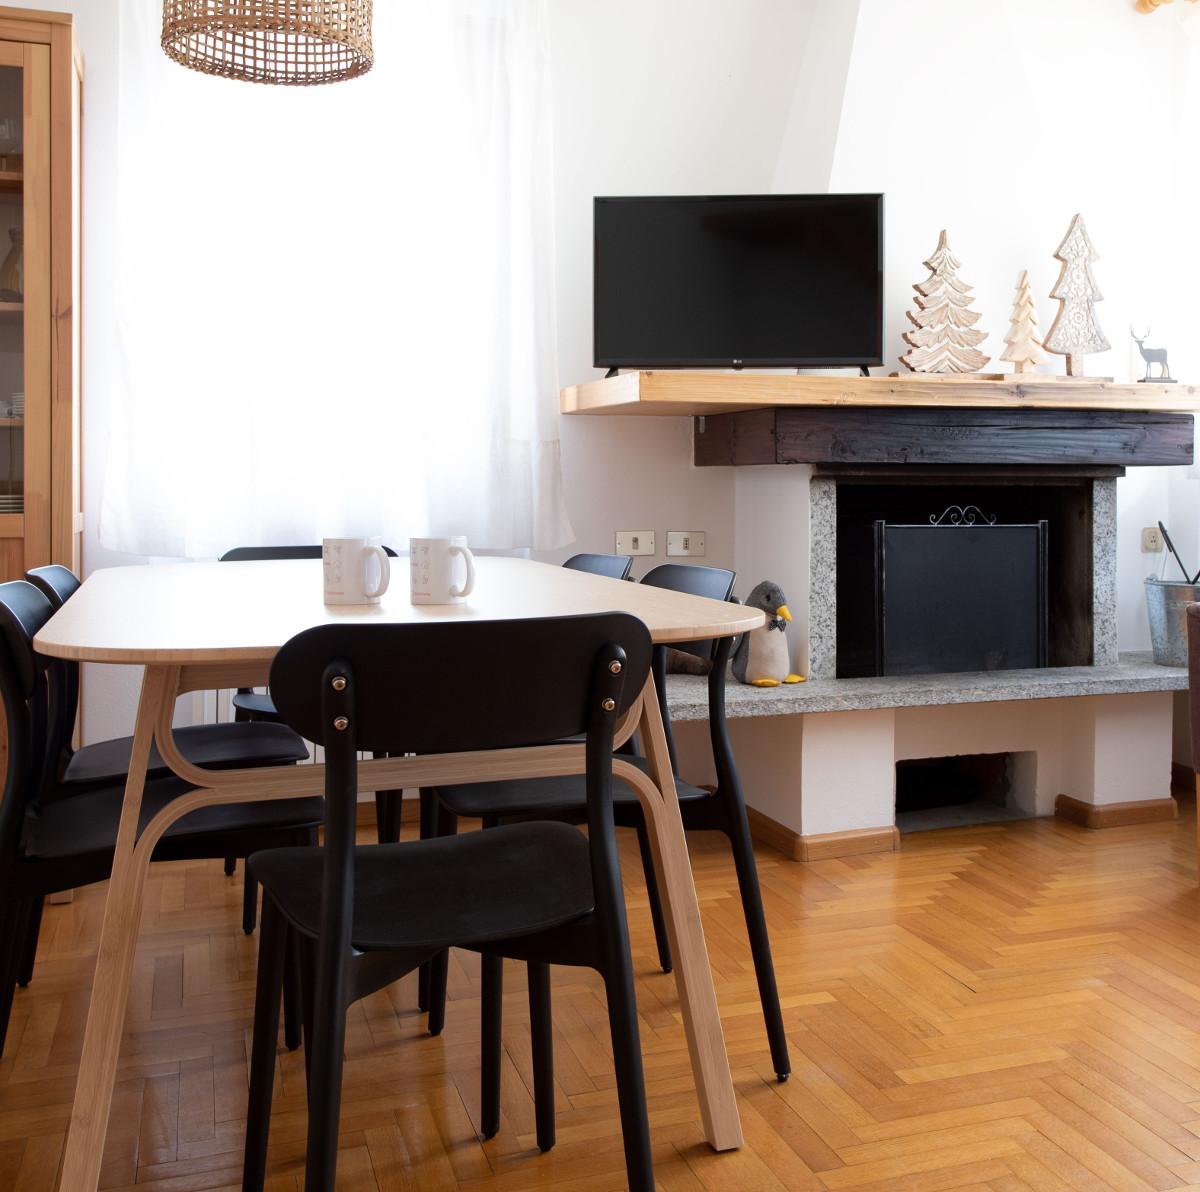 appartamento-italianway-piandelvino-35-zebrù-valdidentro-foto-evidenza